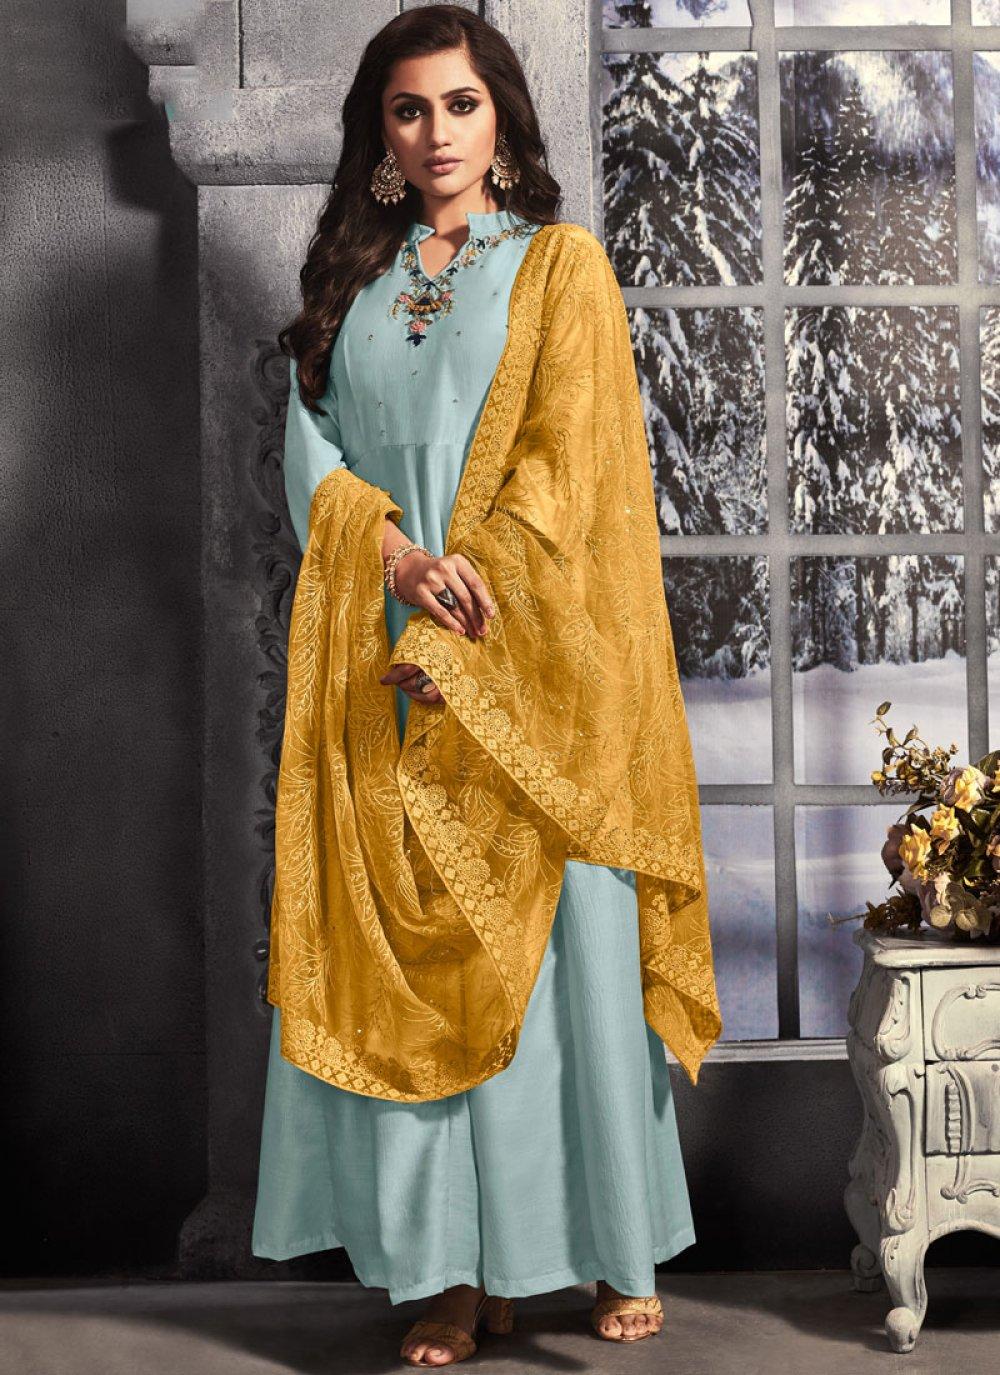 Embroidered Muslin Trendy Anarkali Salwar Kameez in Aqua Blue